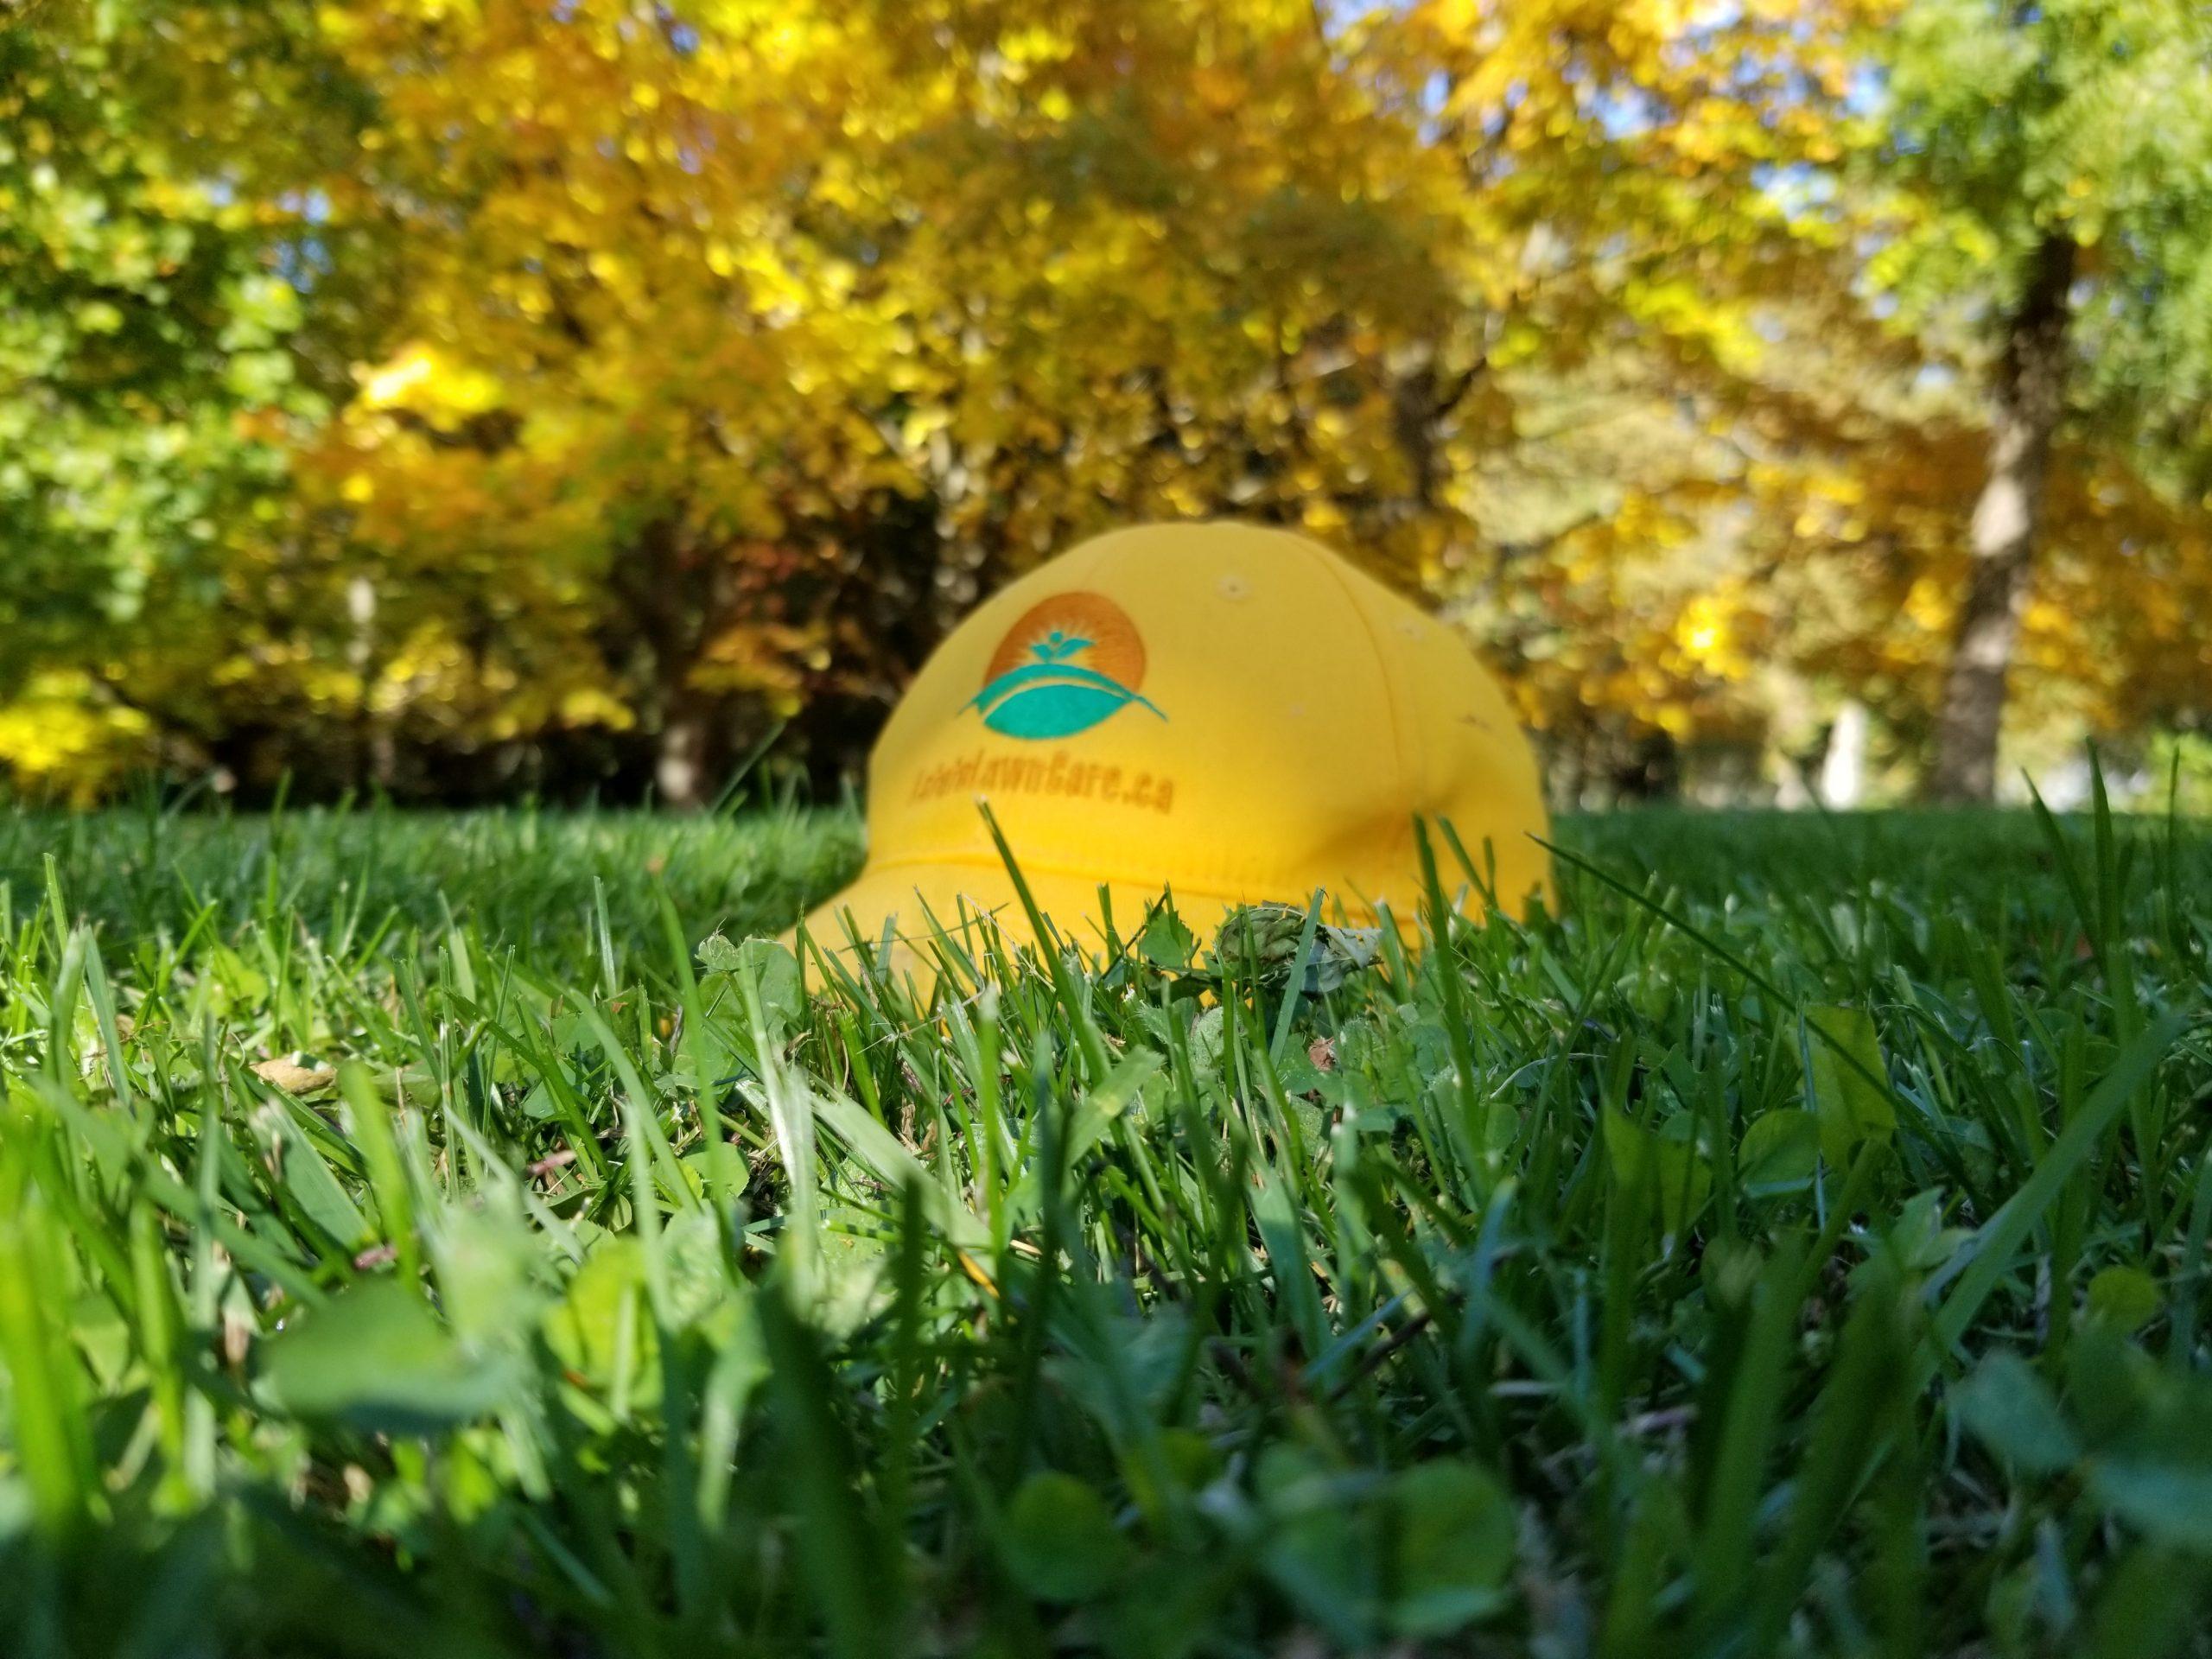 Estate Lawn Care Grass Cutting Services